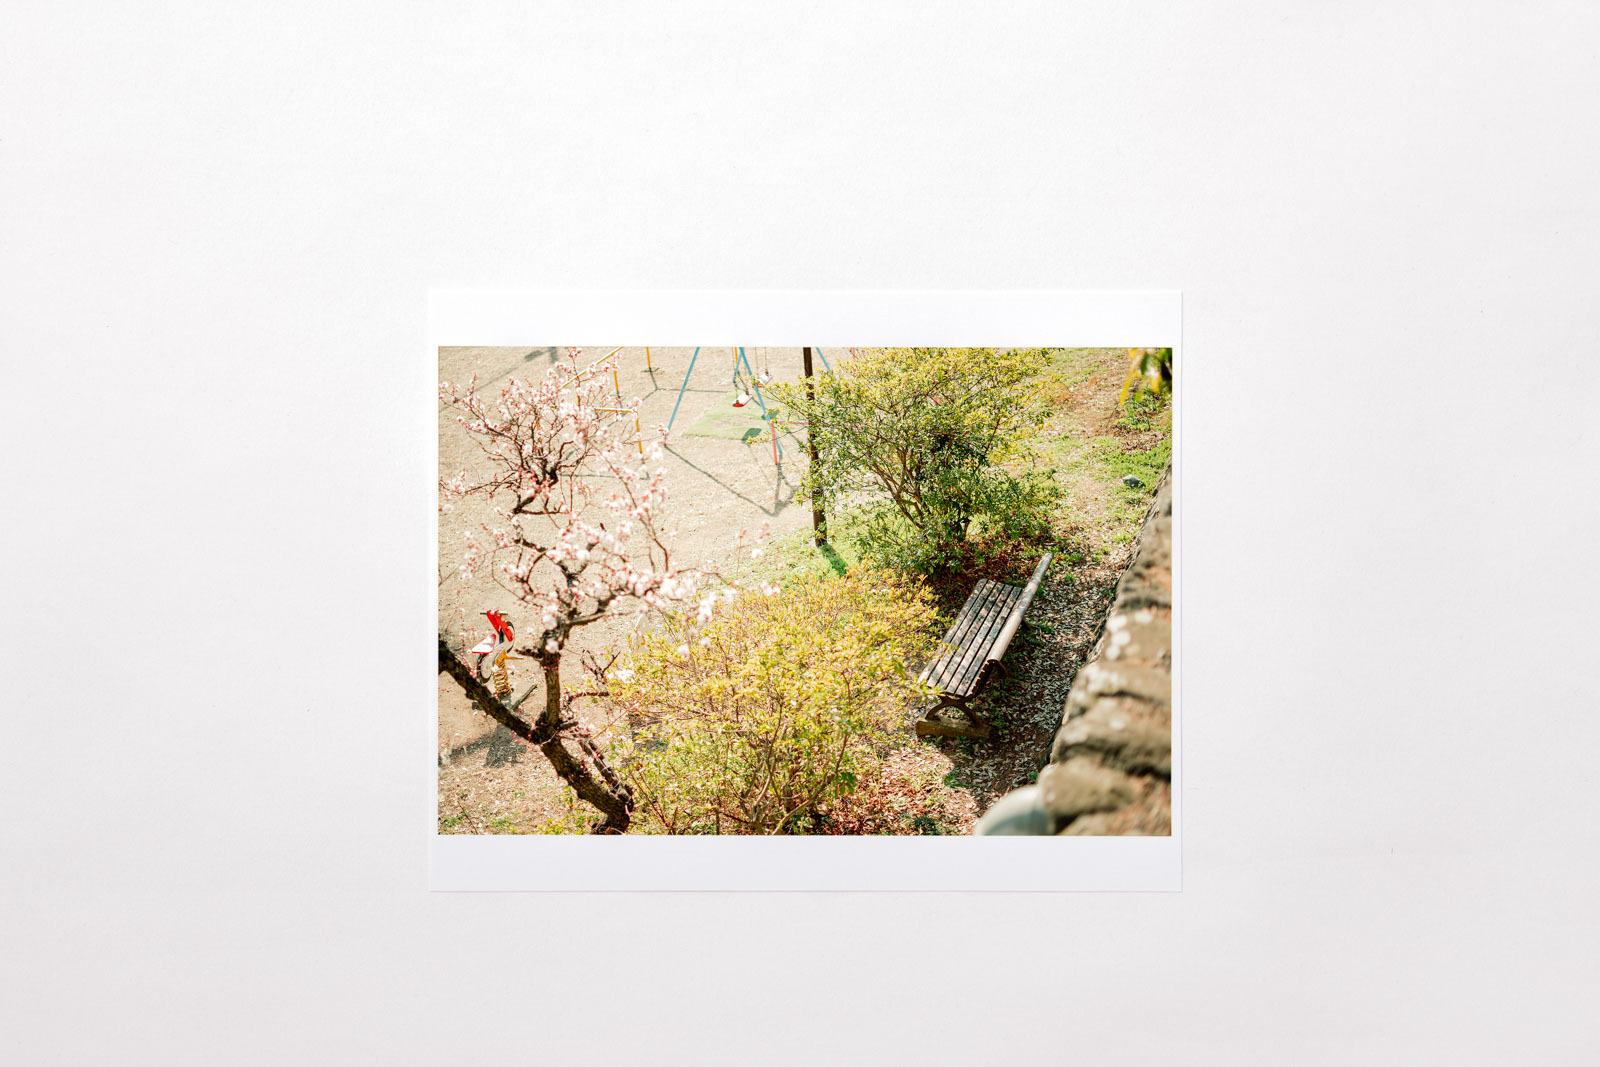 Photograph 08